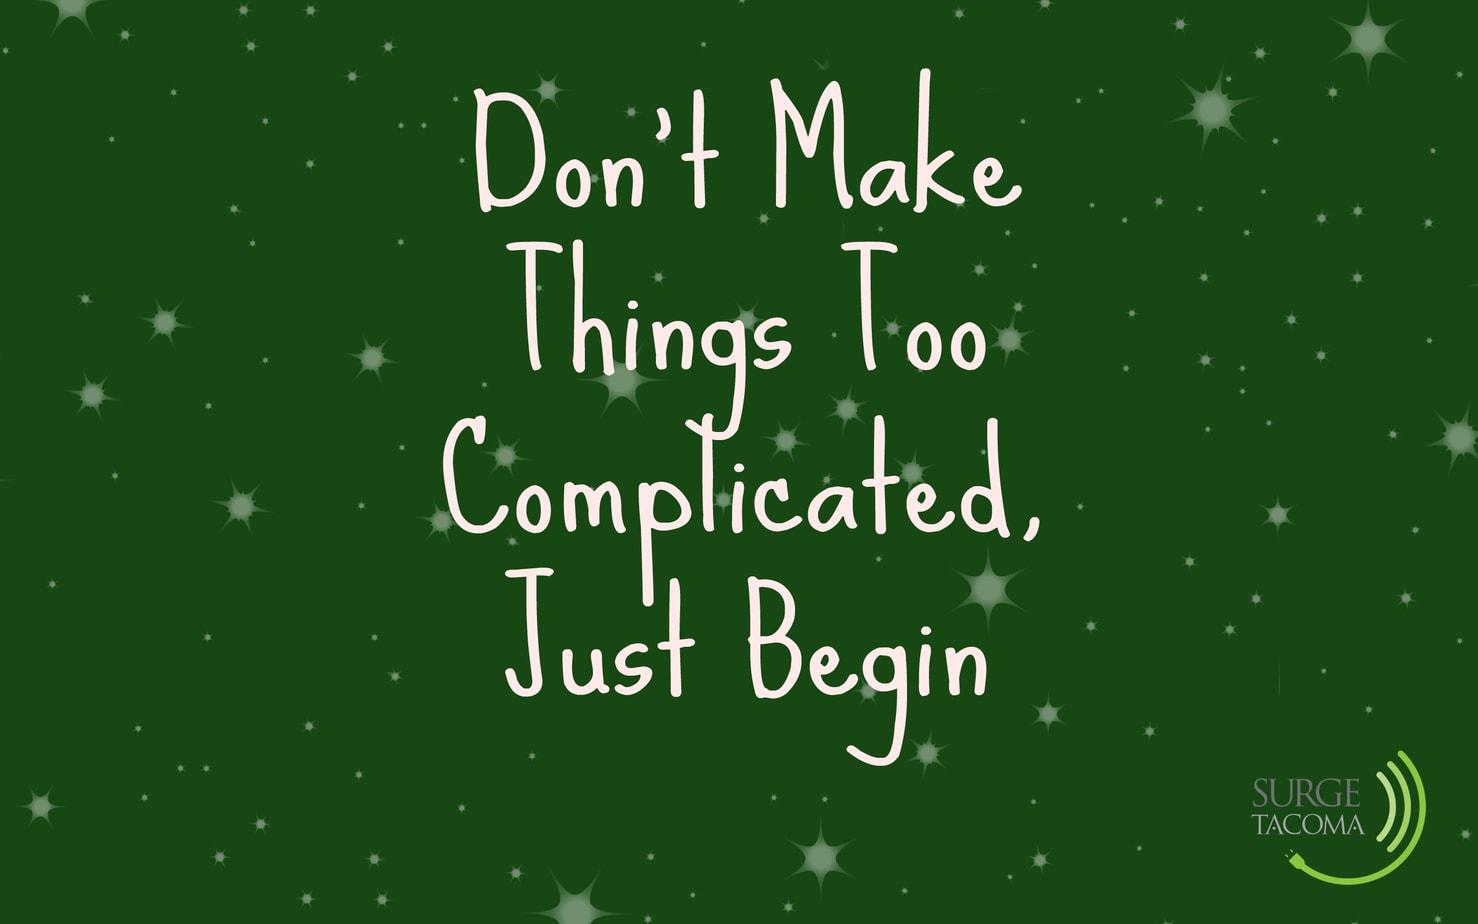 just begin #coworking